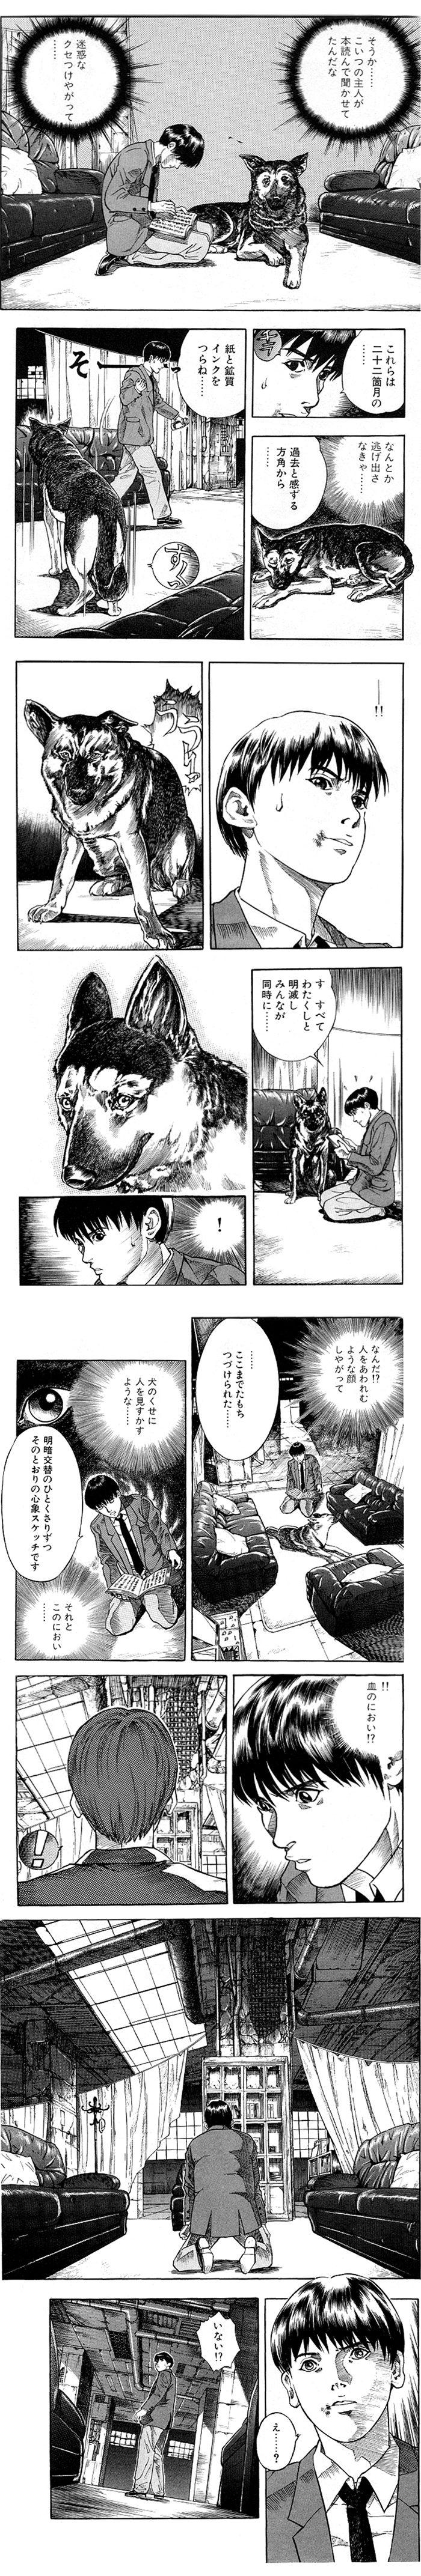 inugami3-02